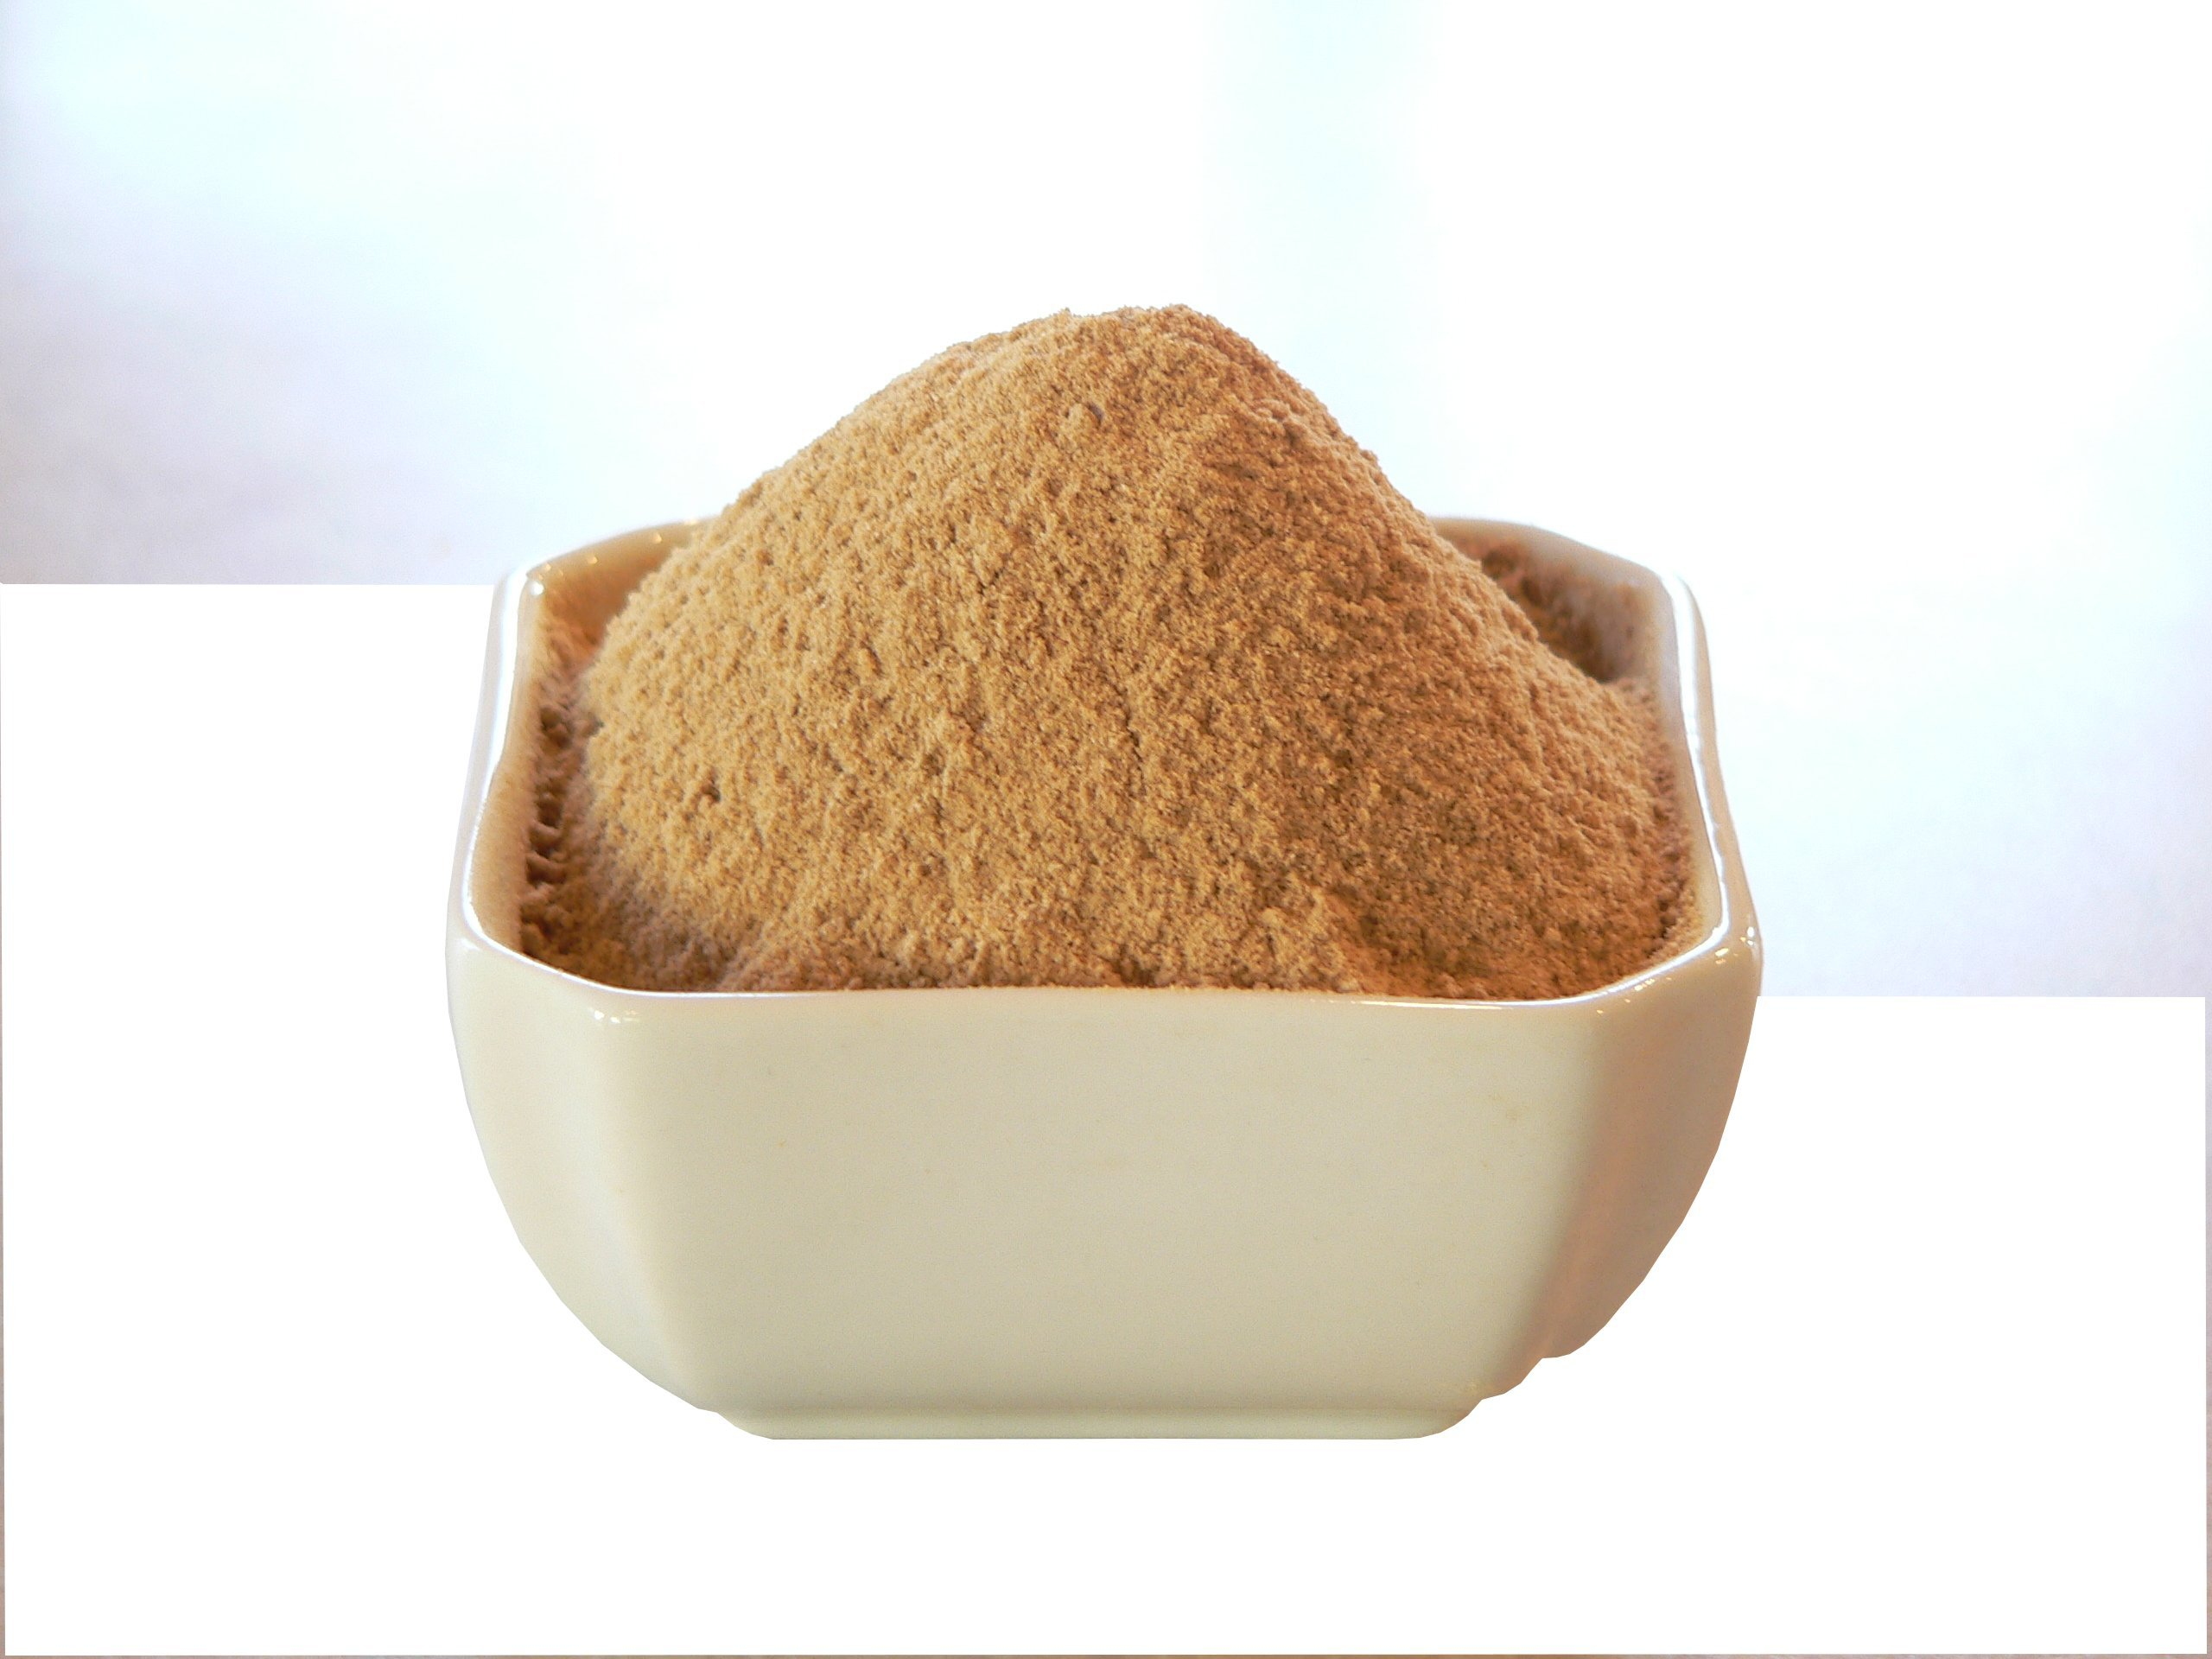 Organic Raw Green Arabica Coffee Bean Extract Powder 51.7% Chlorogenic Acid 4 oz Resealable Bag